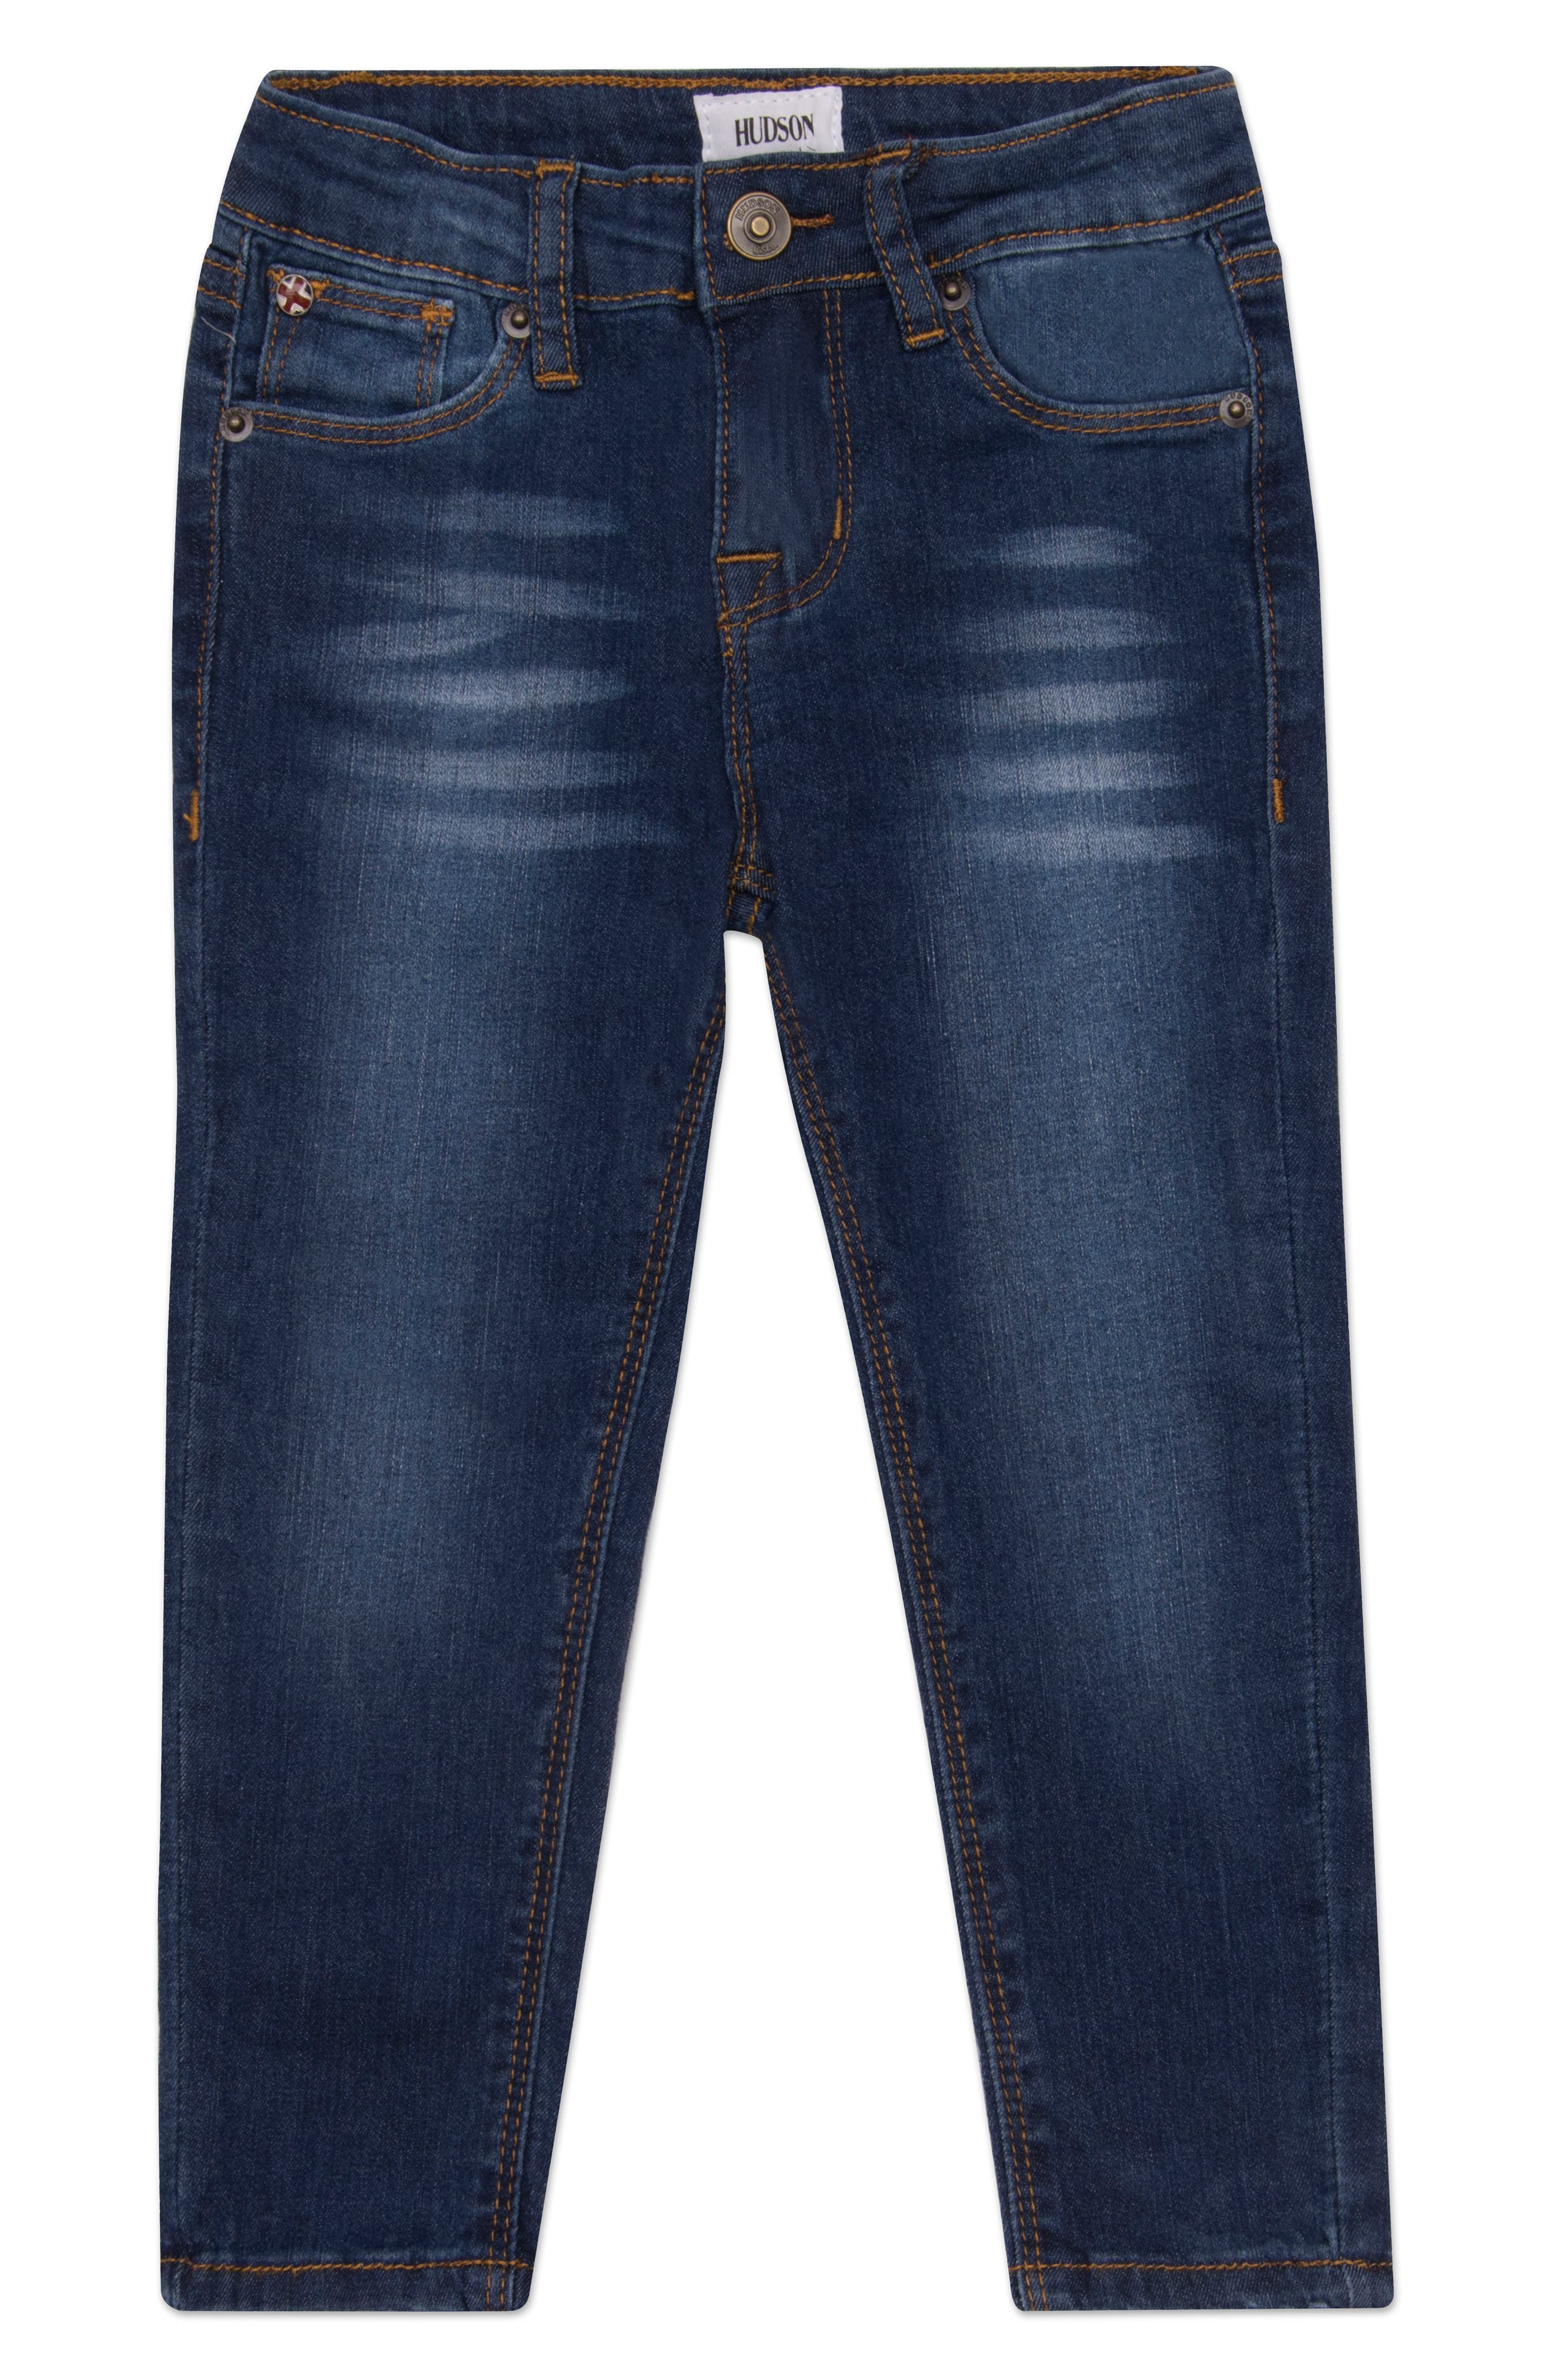 Hudson Kids Christa Super Stretch Skinny Jeans (Baby Girls)